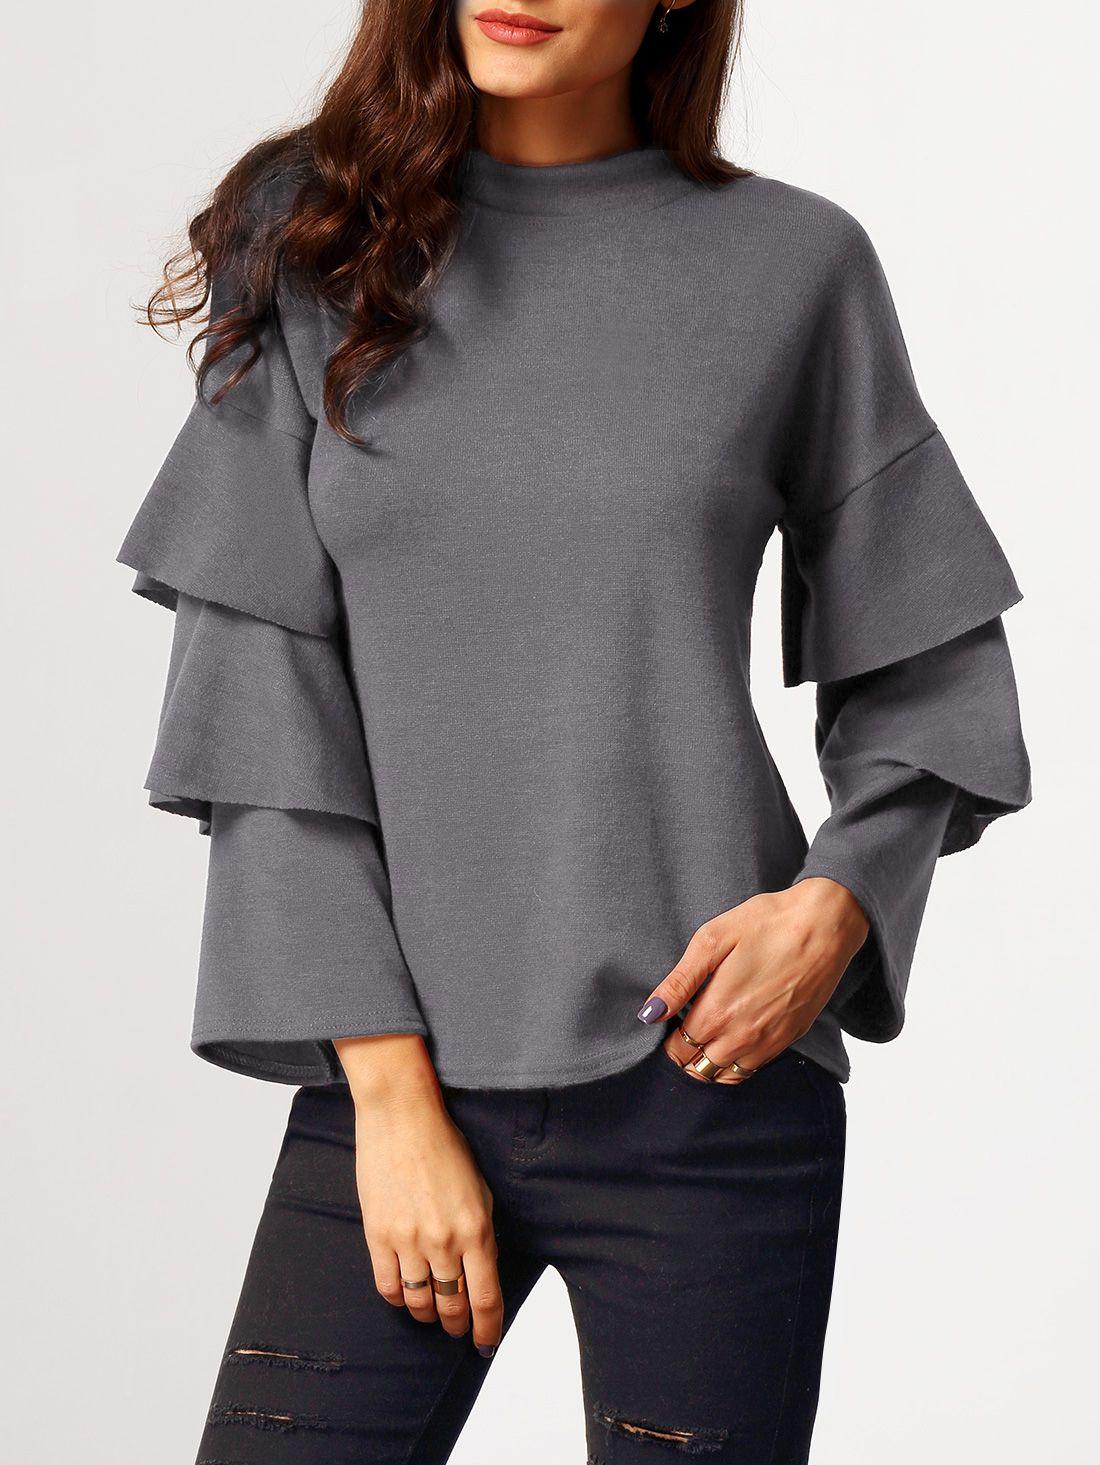 Stand Neck Blouse Designs : Best blouse online ideas on pinterest indian